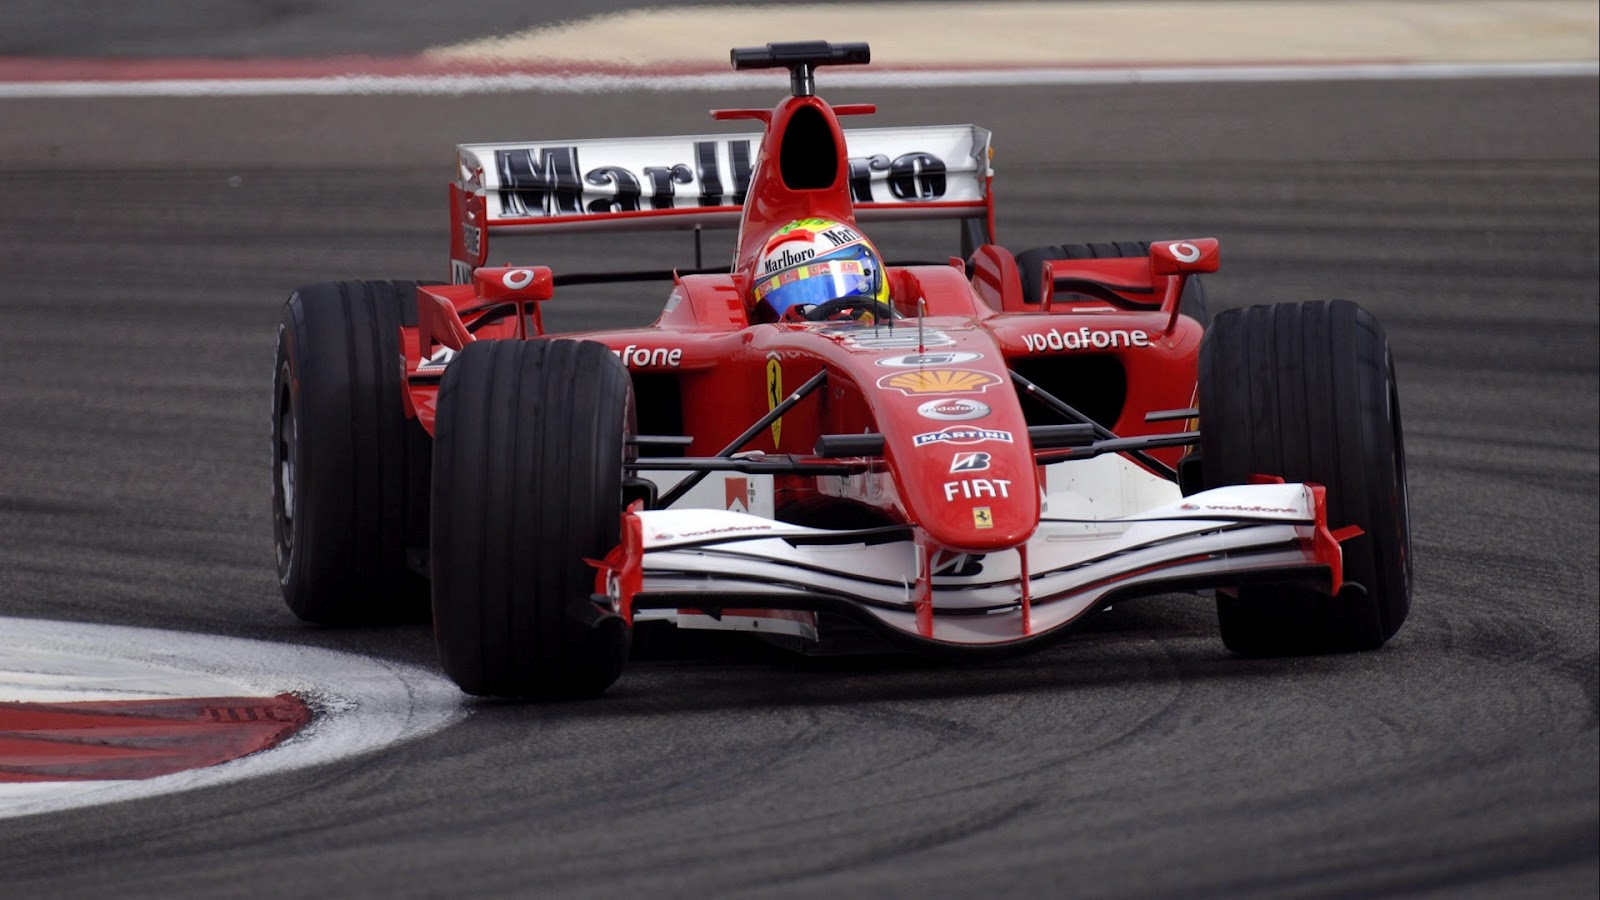 Ferrari Racing Cars Wallpaper